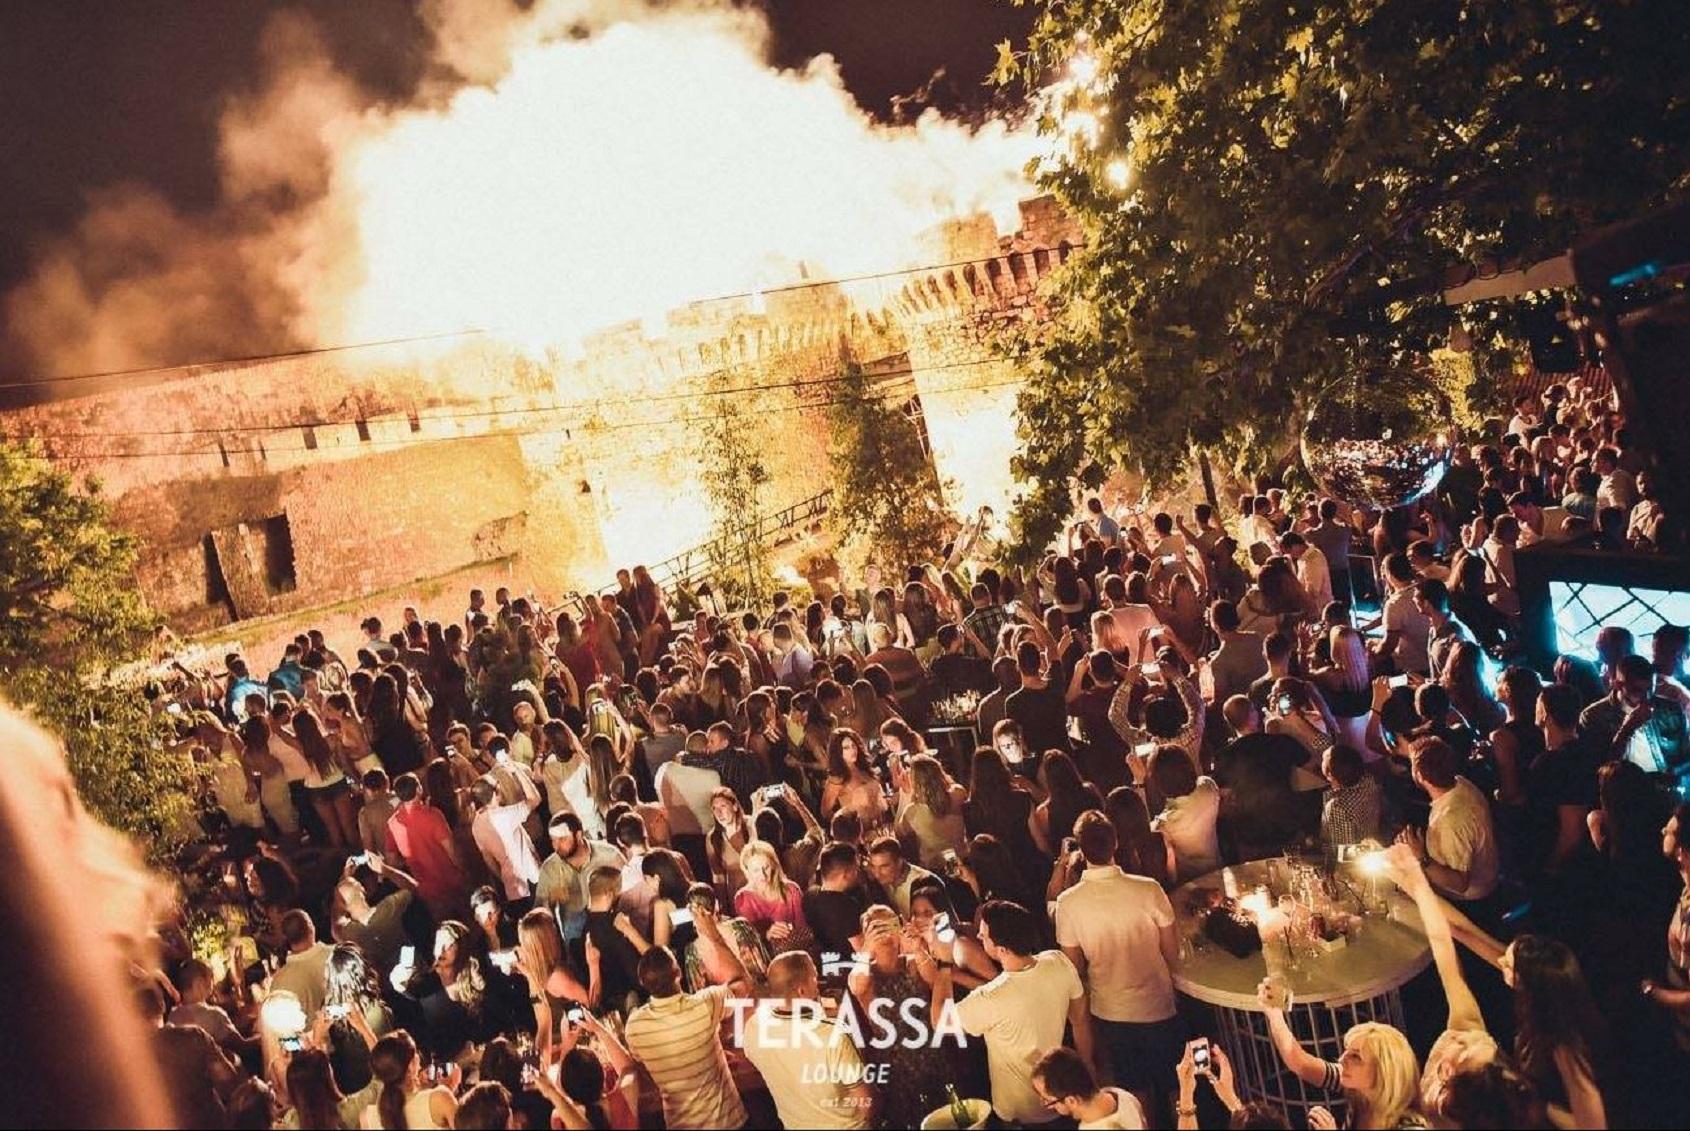 Terassa Lounge Belgrad